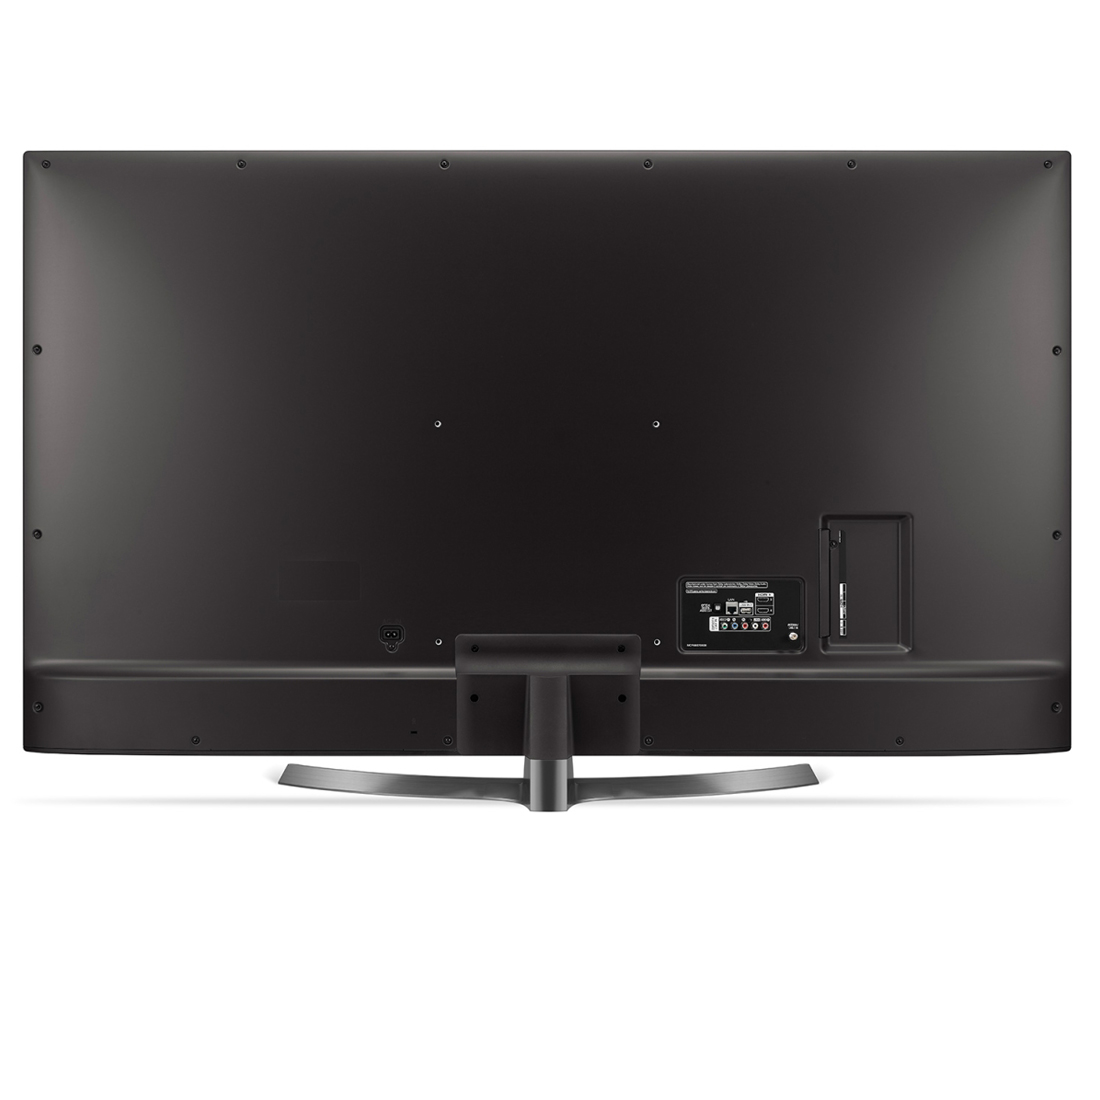 تلویزیون ال ای دی هوشمند ال جی مدل 55UK69000GI سایز 55 اینچ